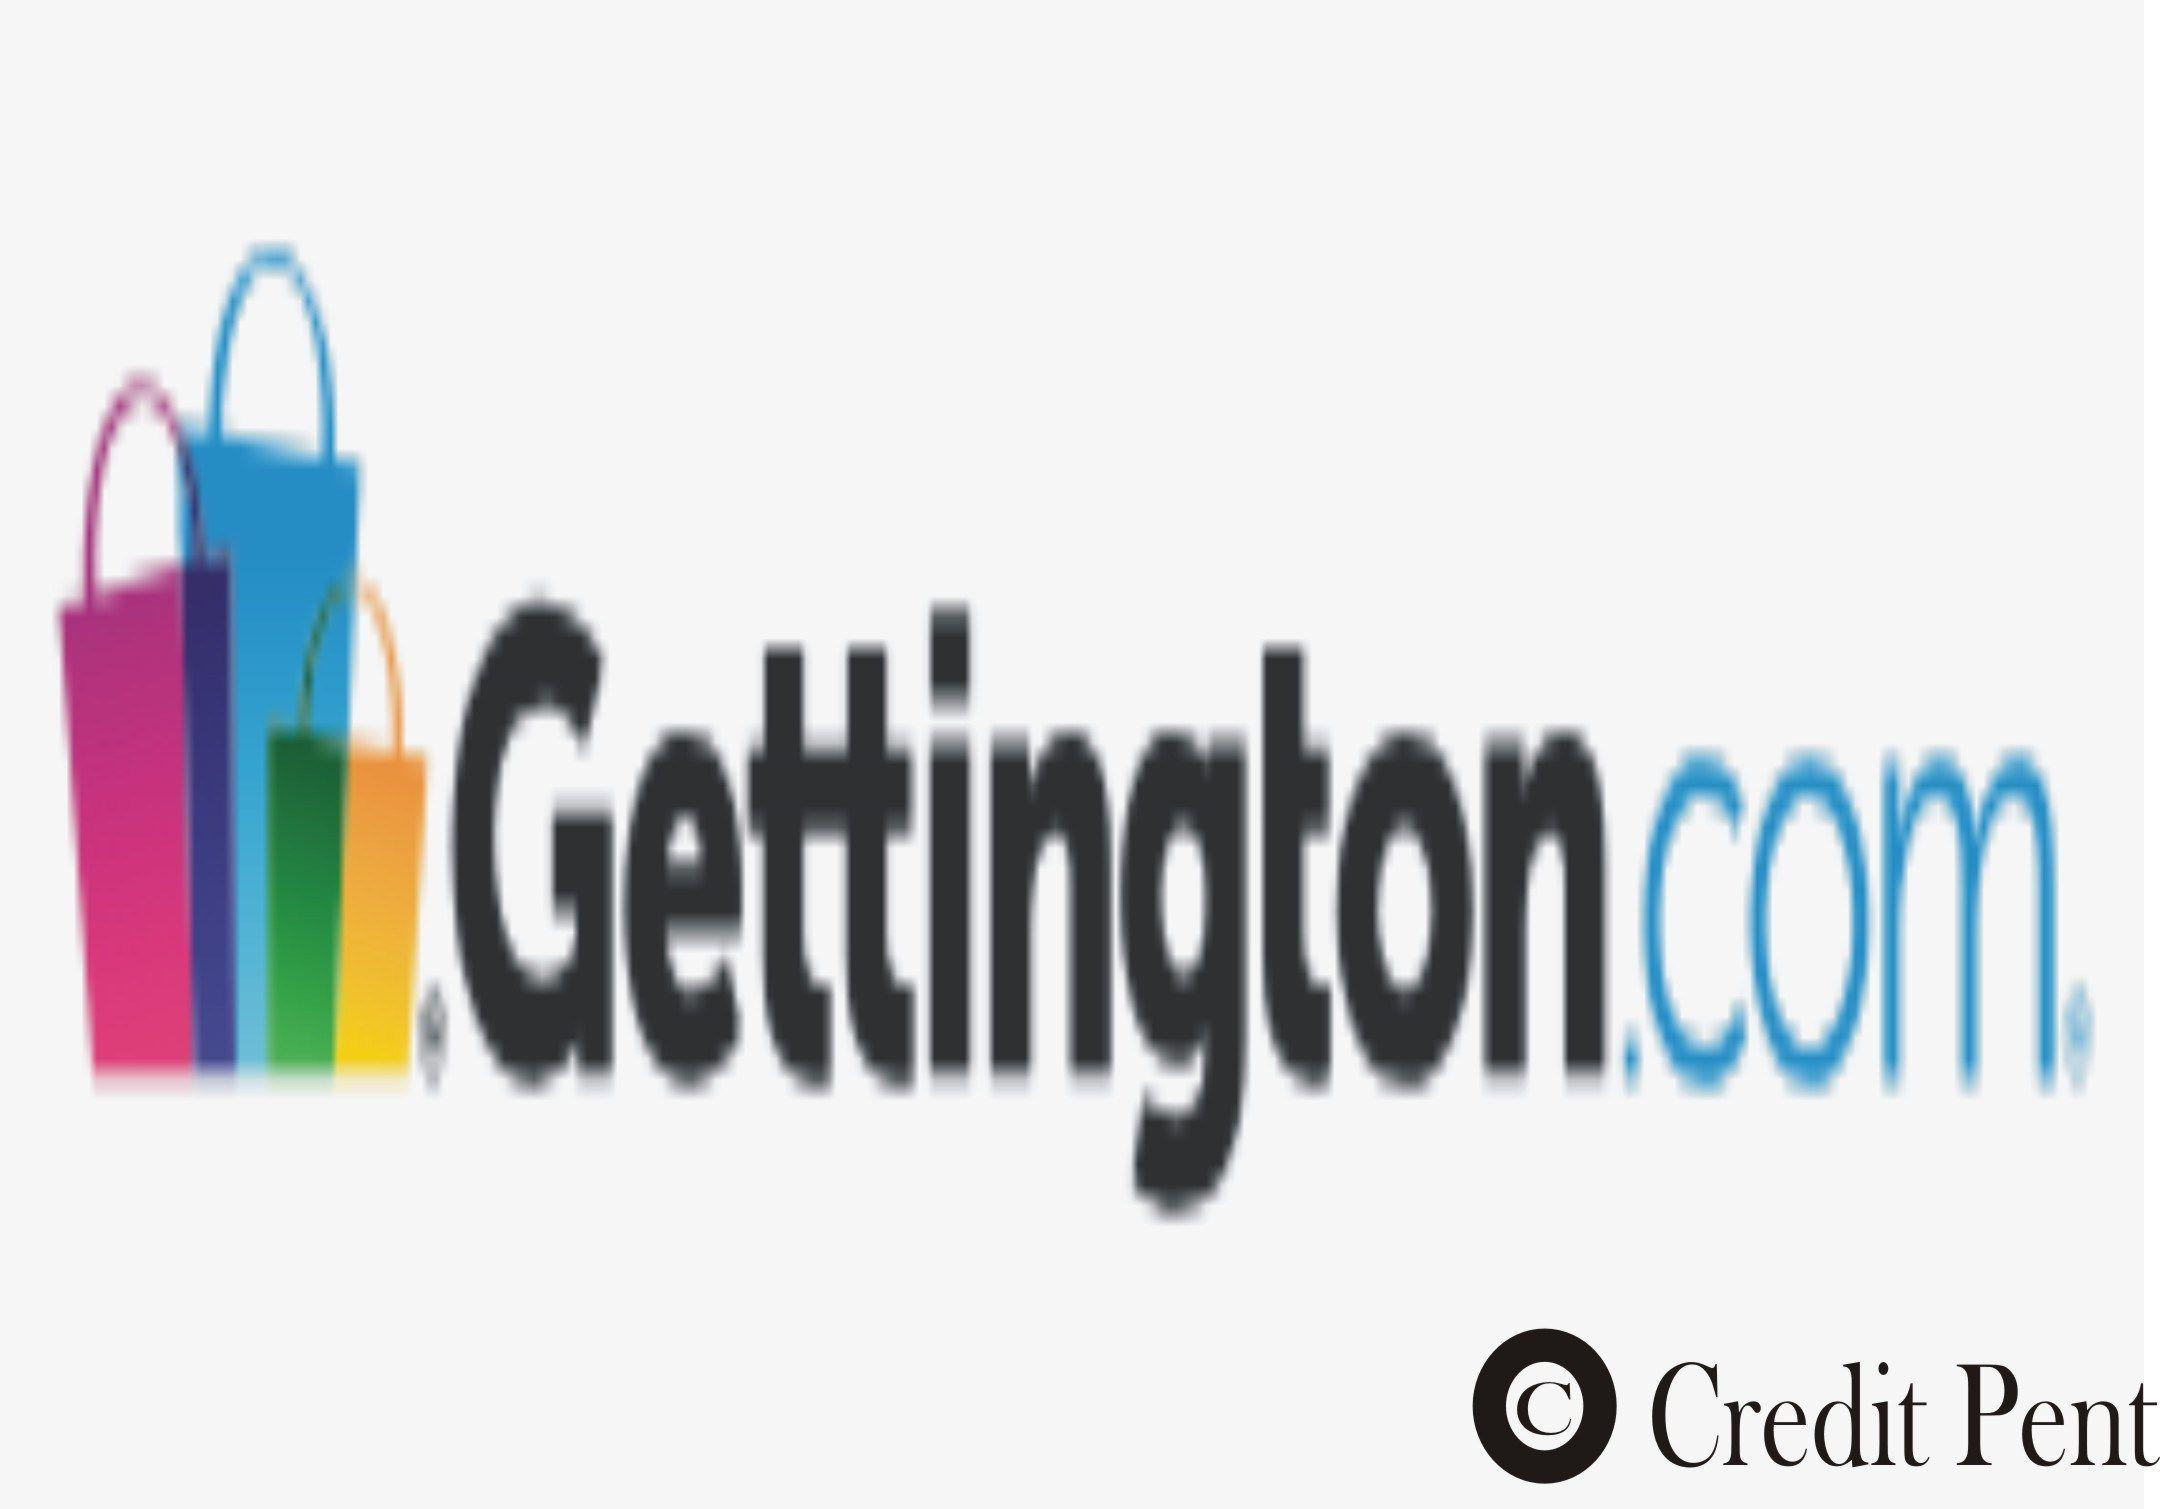 Gettington Credit Card Login Review Application